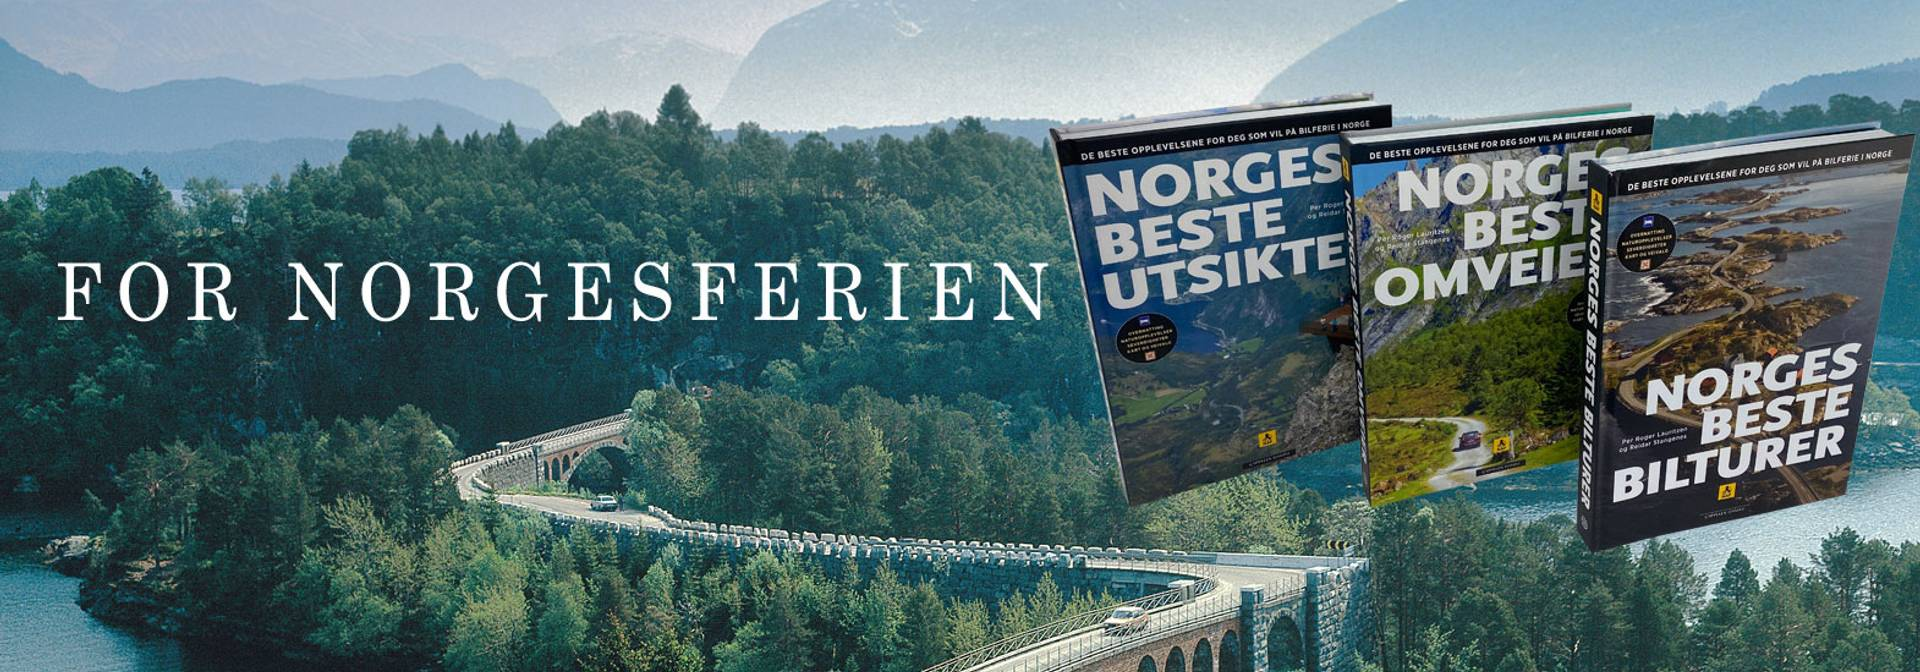 Gavetips for norgesferien